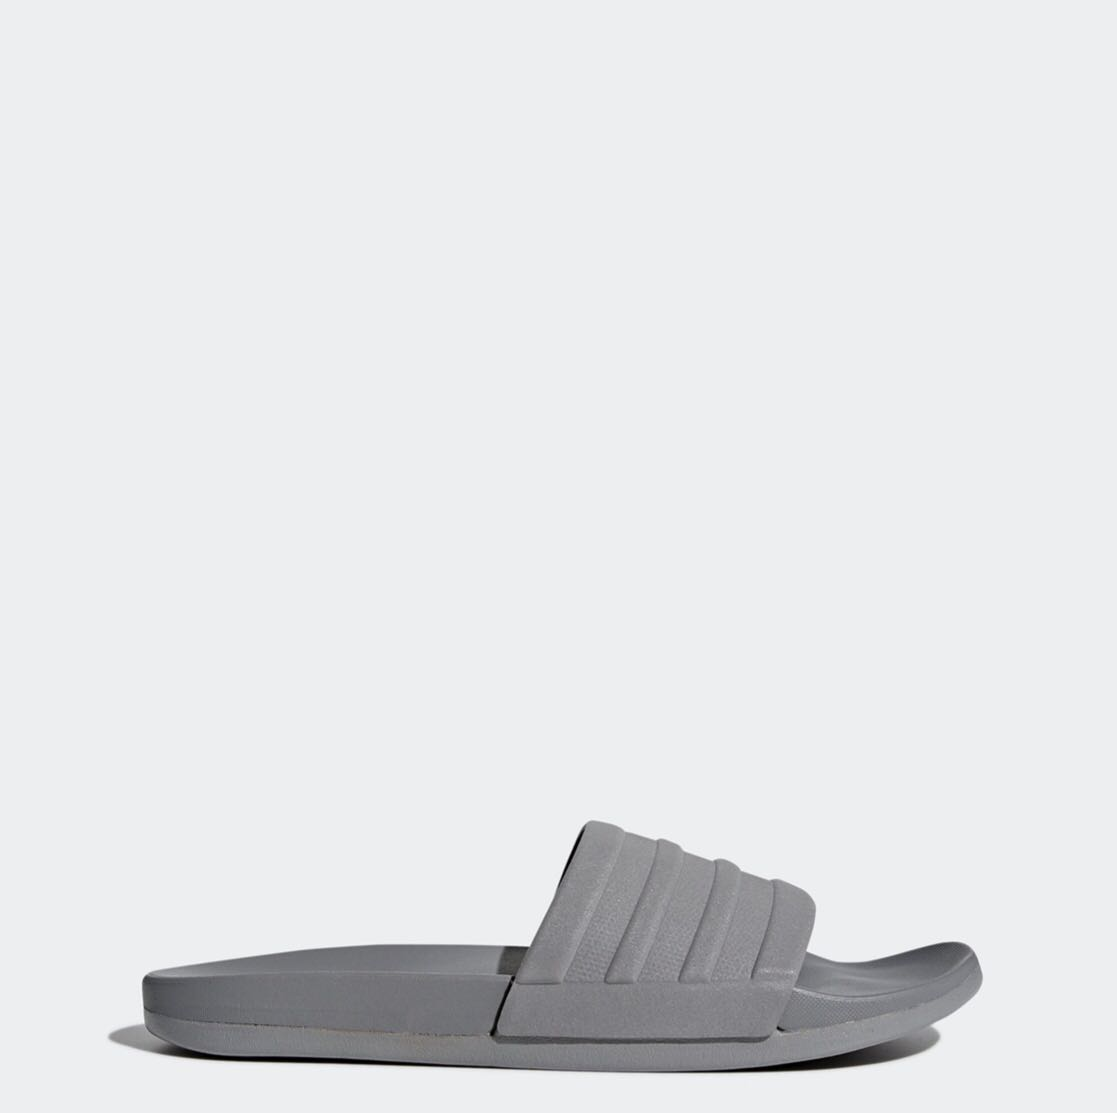 444612051 Adidas Adilette Cloudfoam Plus Mono Slides